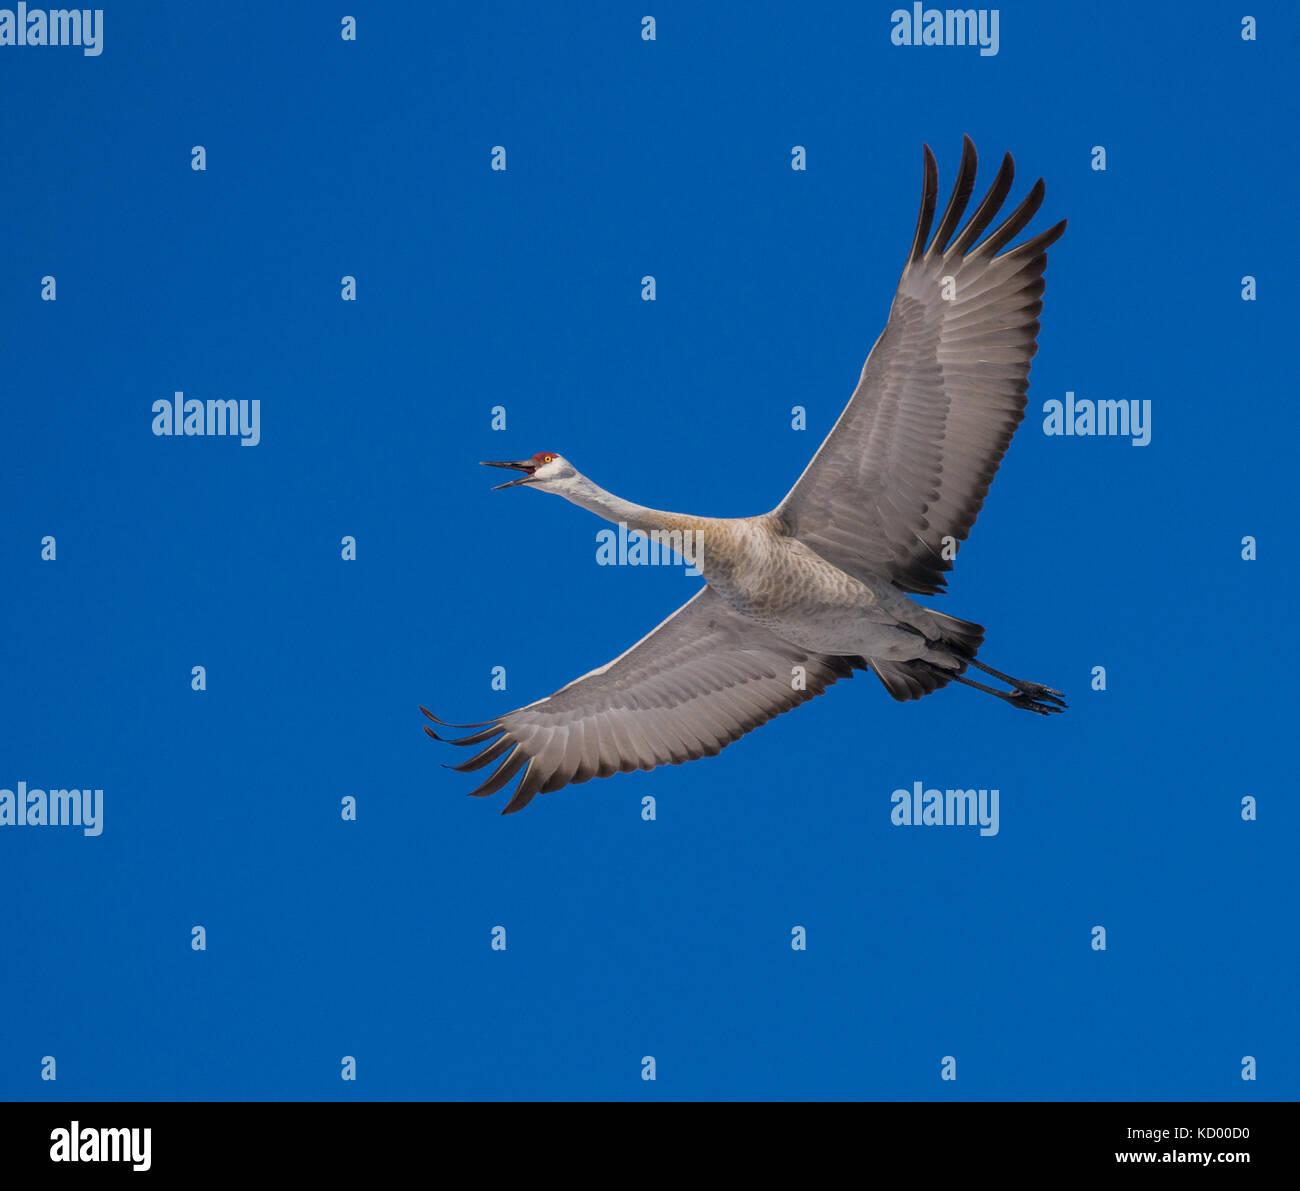 sandhill crane, Grus canadensis, North Bay region, West Nipissing, north eastern ontario Stock Photo